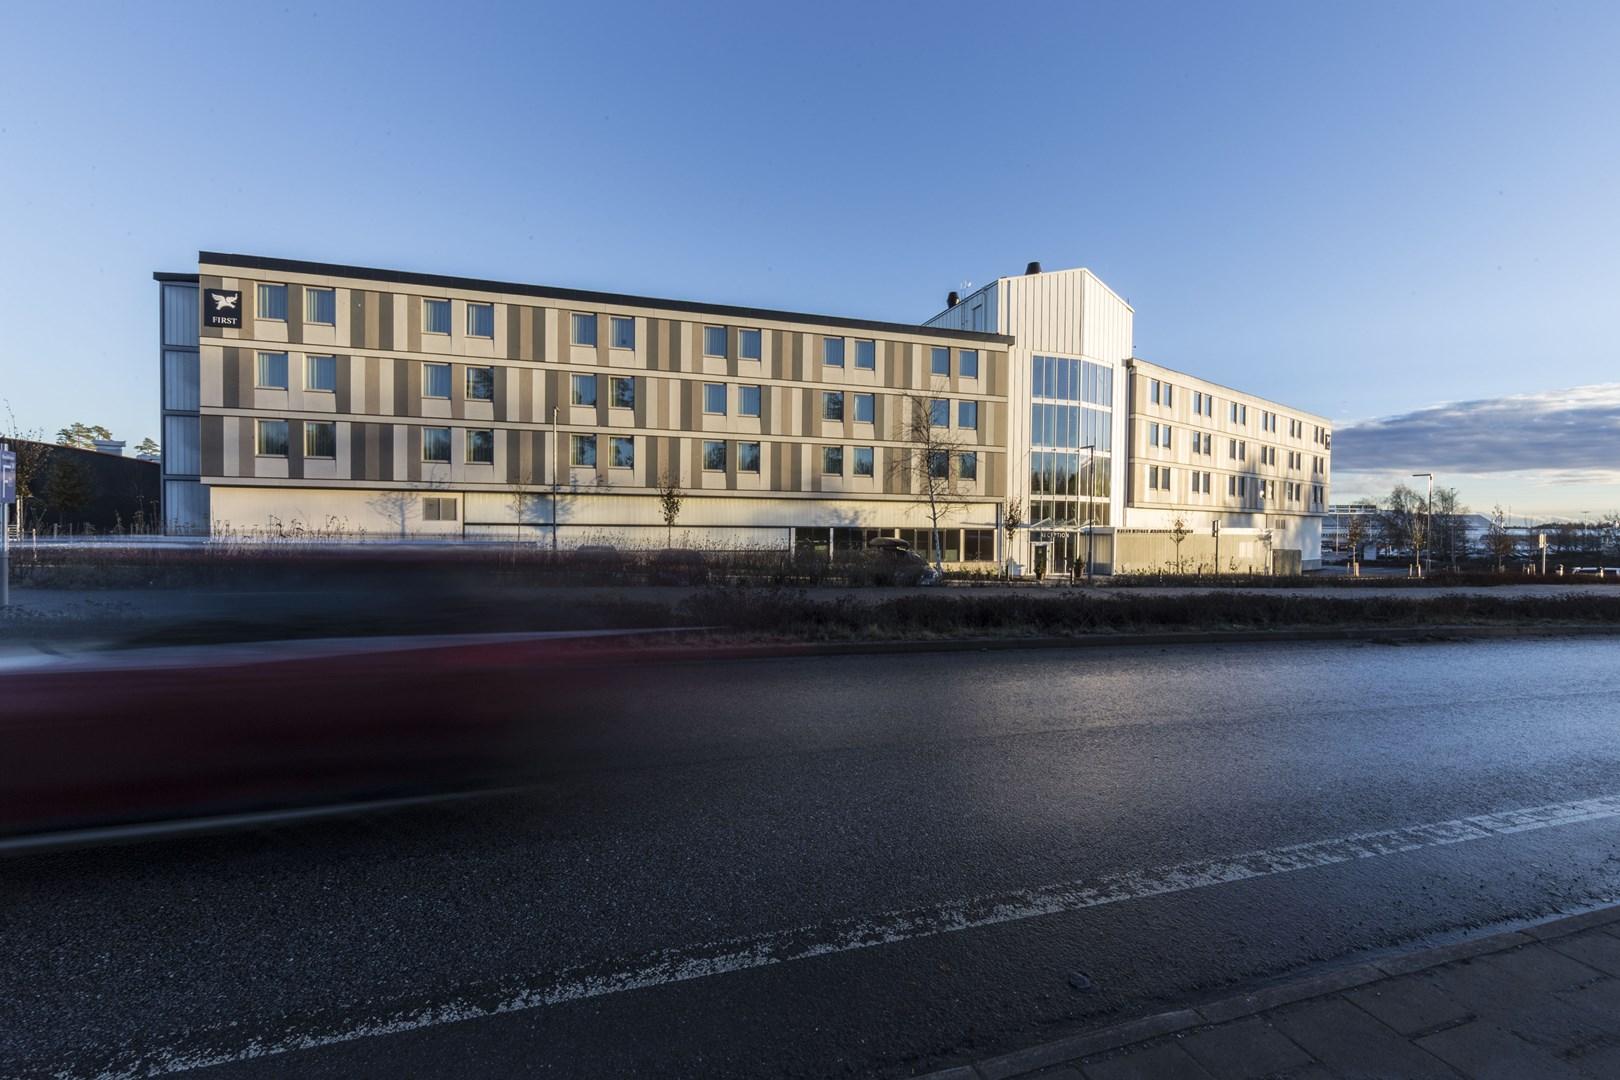 First Hotel Arlanda Airport, Stockholm, Sweden